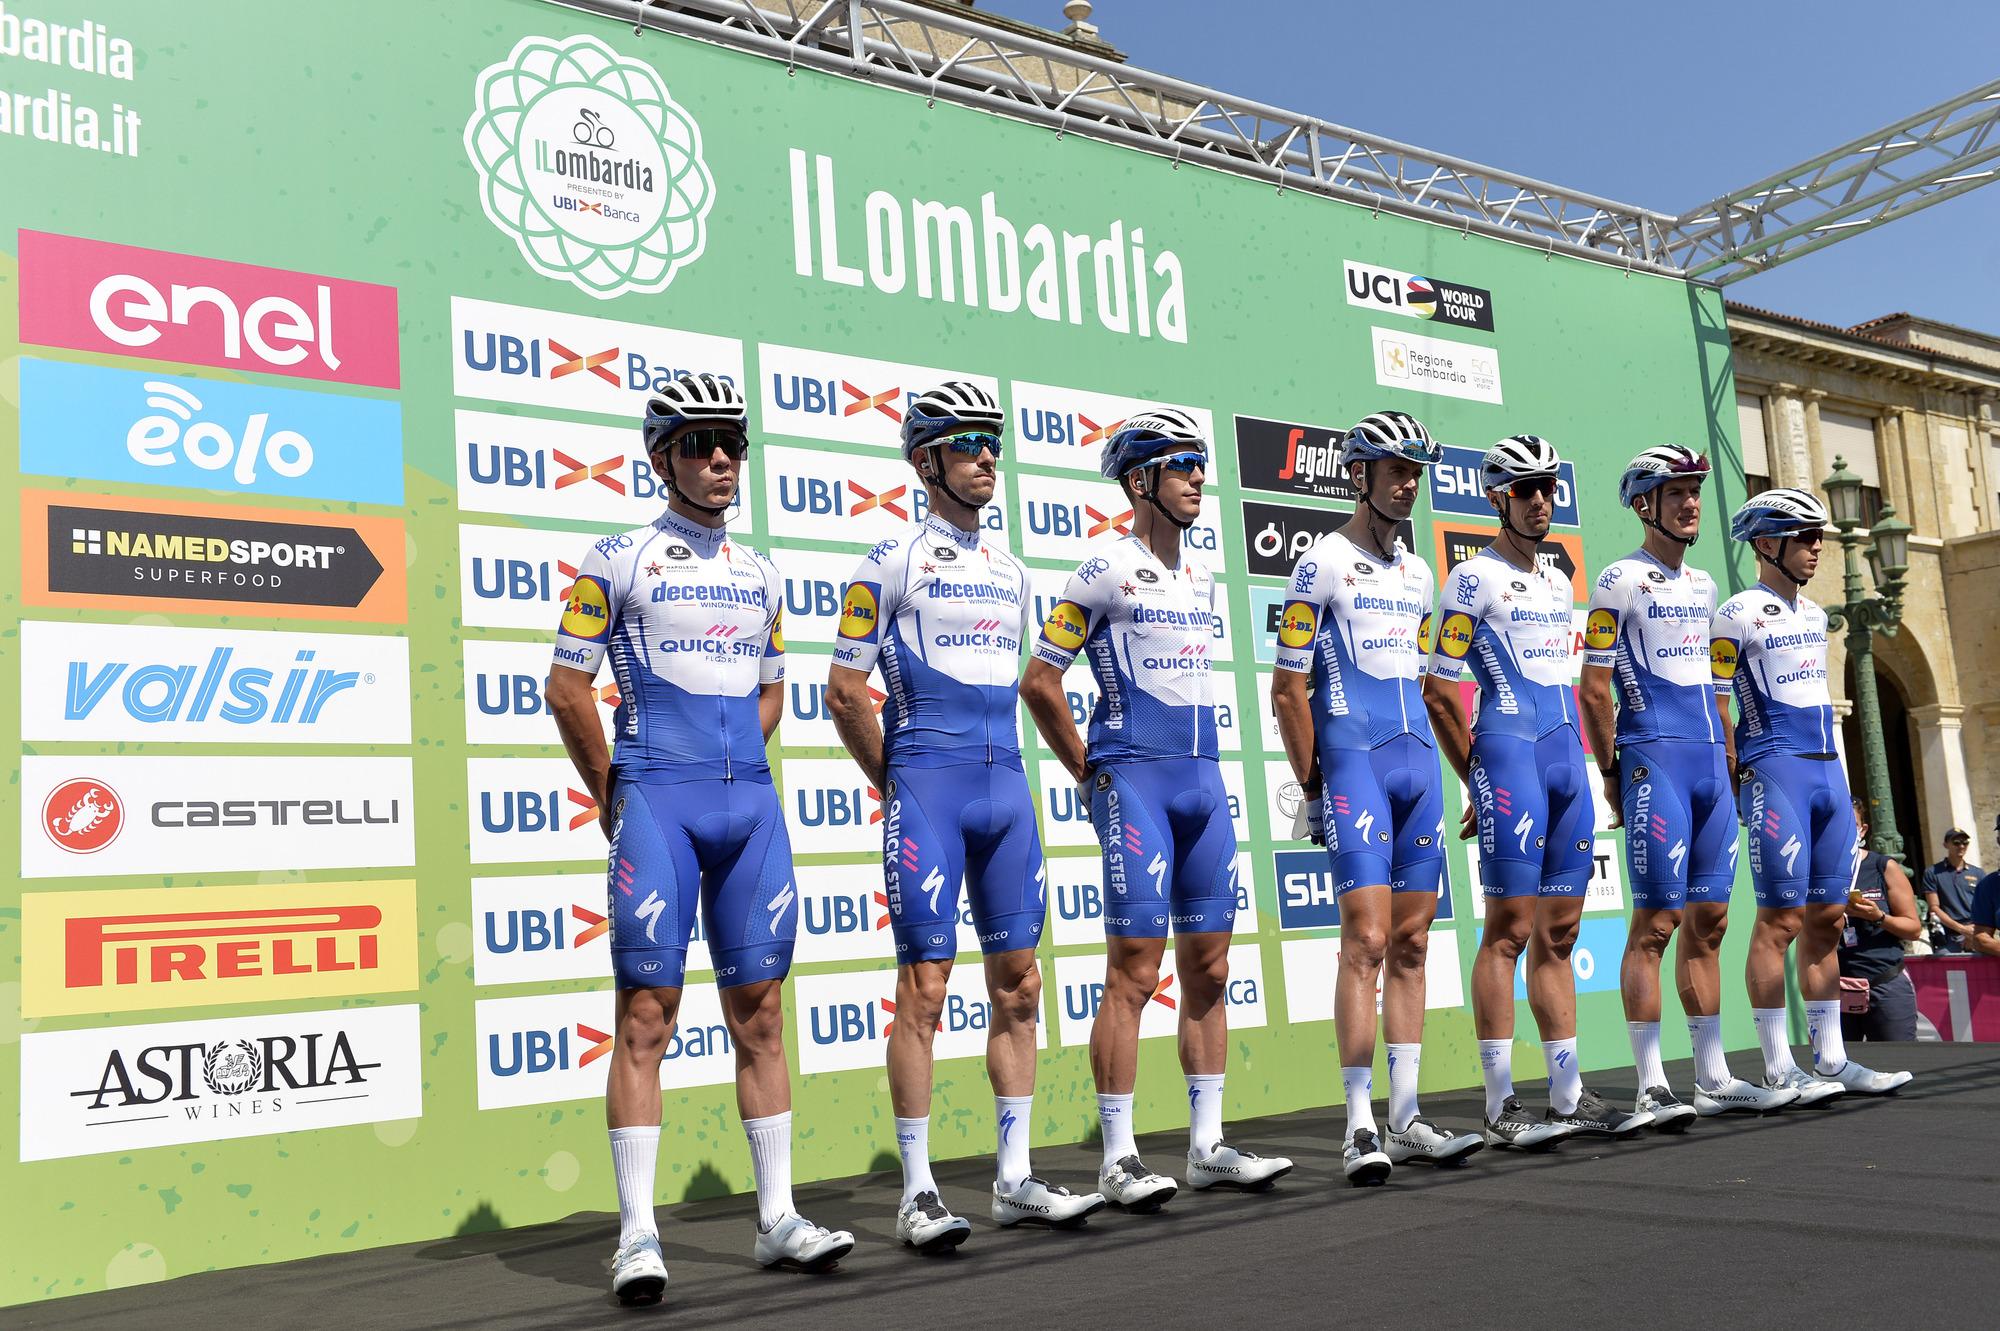 Remco Evenepoel leads Deceuninck-QuickStep at Il Lombardia